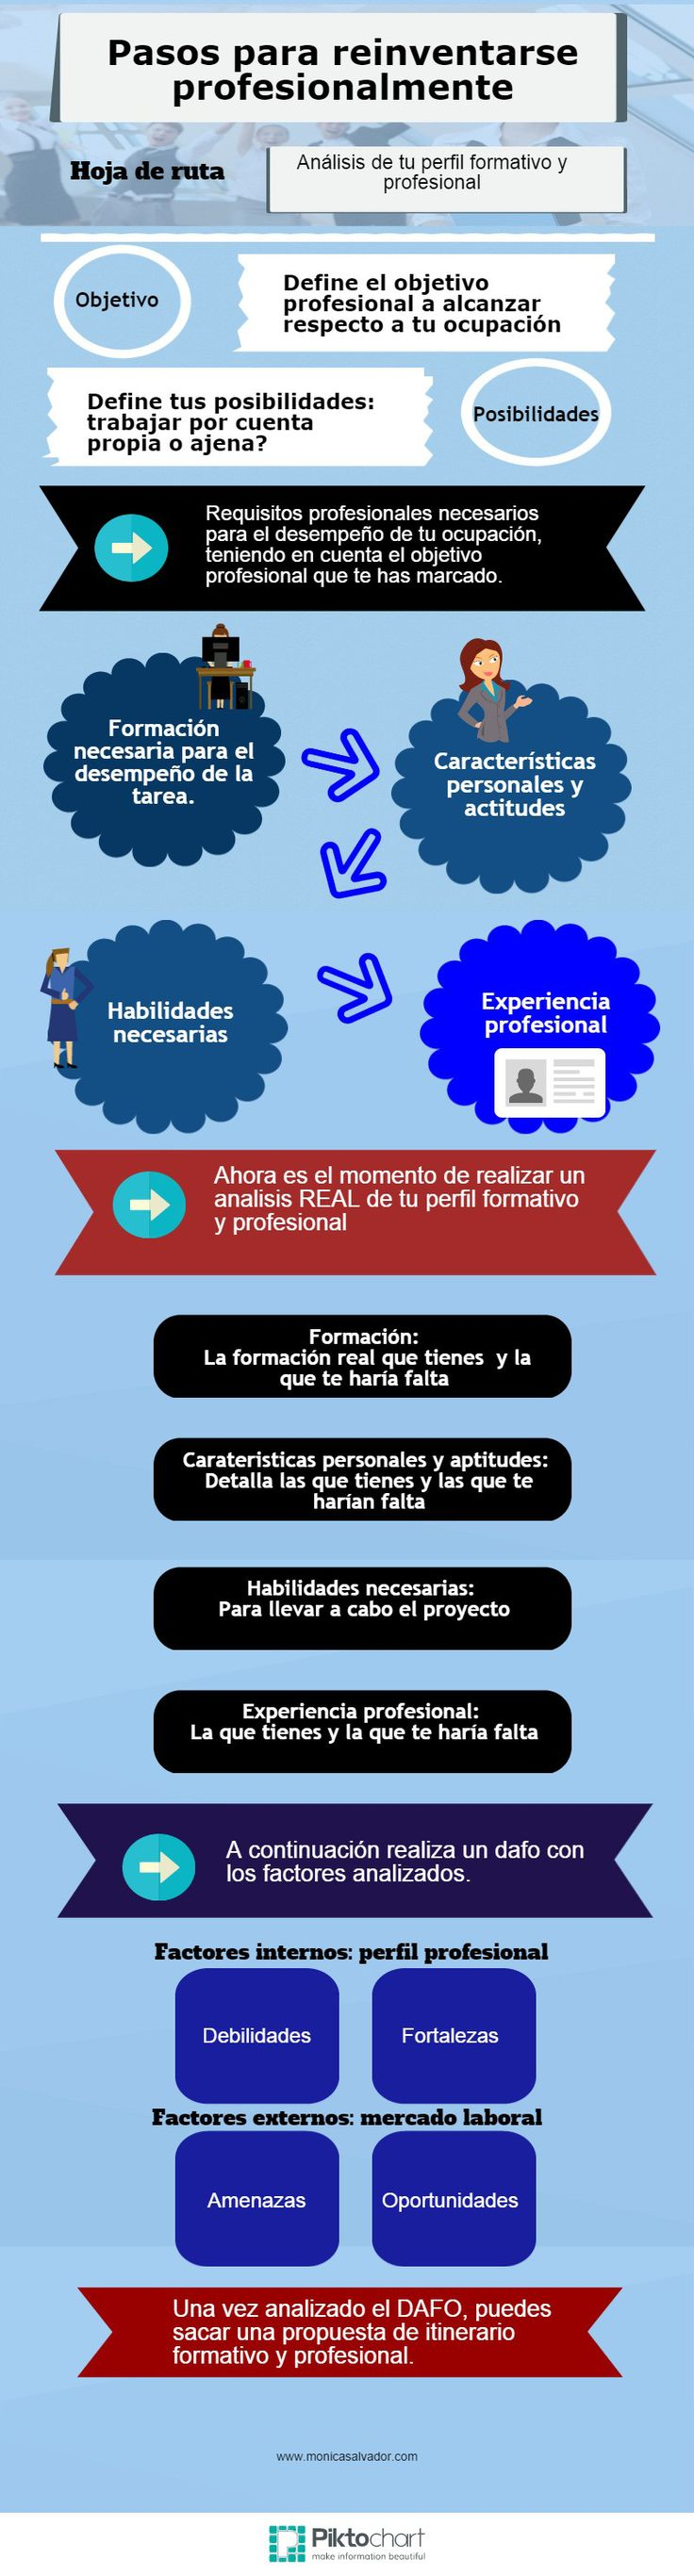 Pasos para reinventarse profesionalmente #infografia #infographic #empleo #rrhh #recursoshumanos